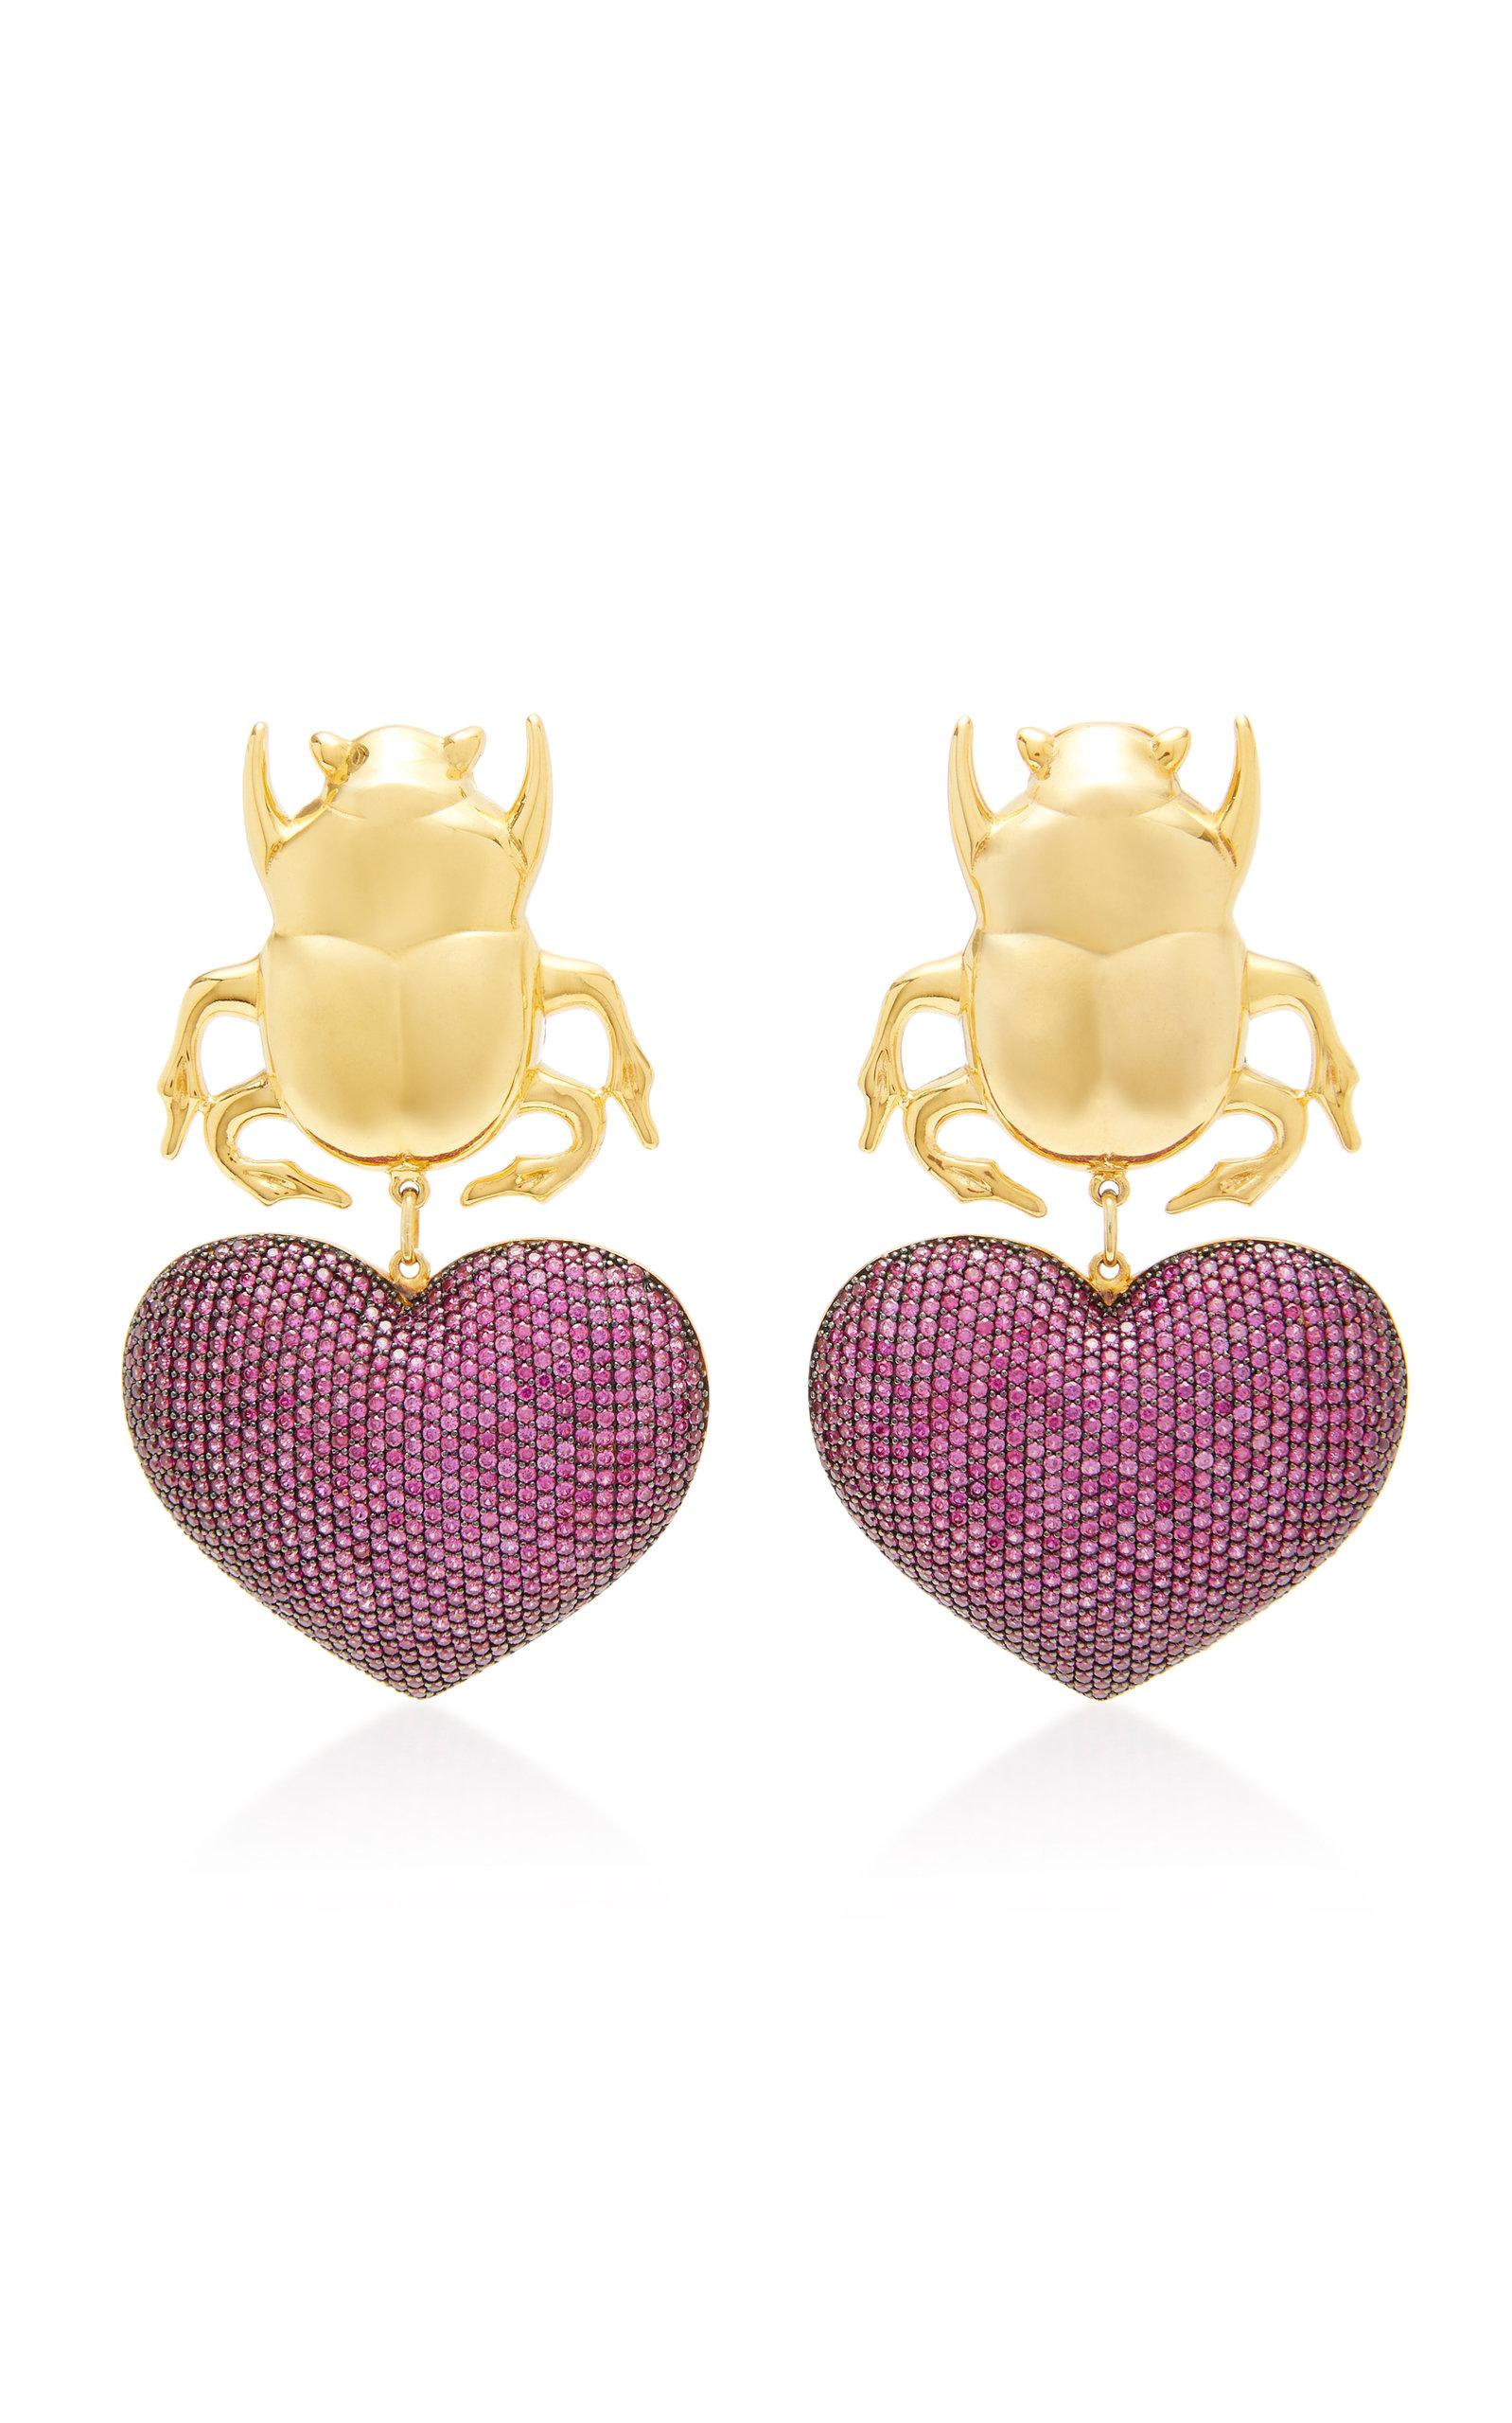 8eb852b1df20c Beetle My Love 24K Gold-Plated Crystal Earrings